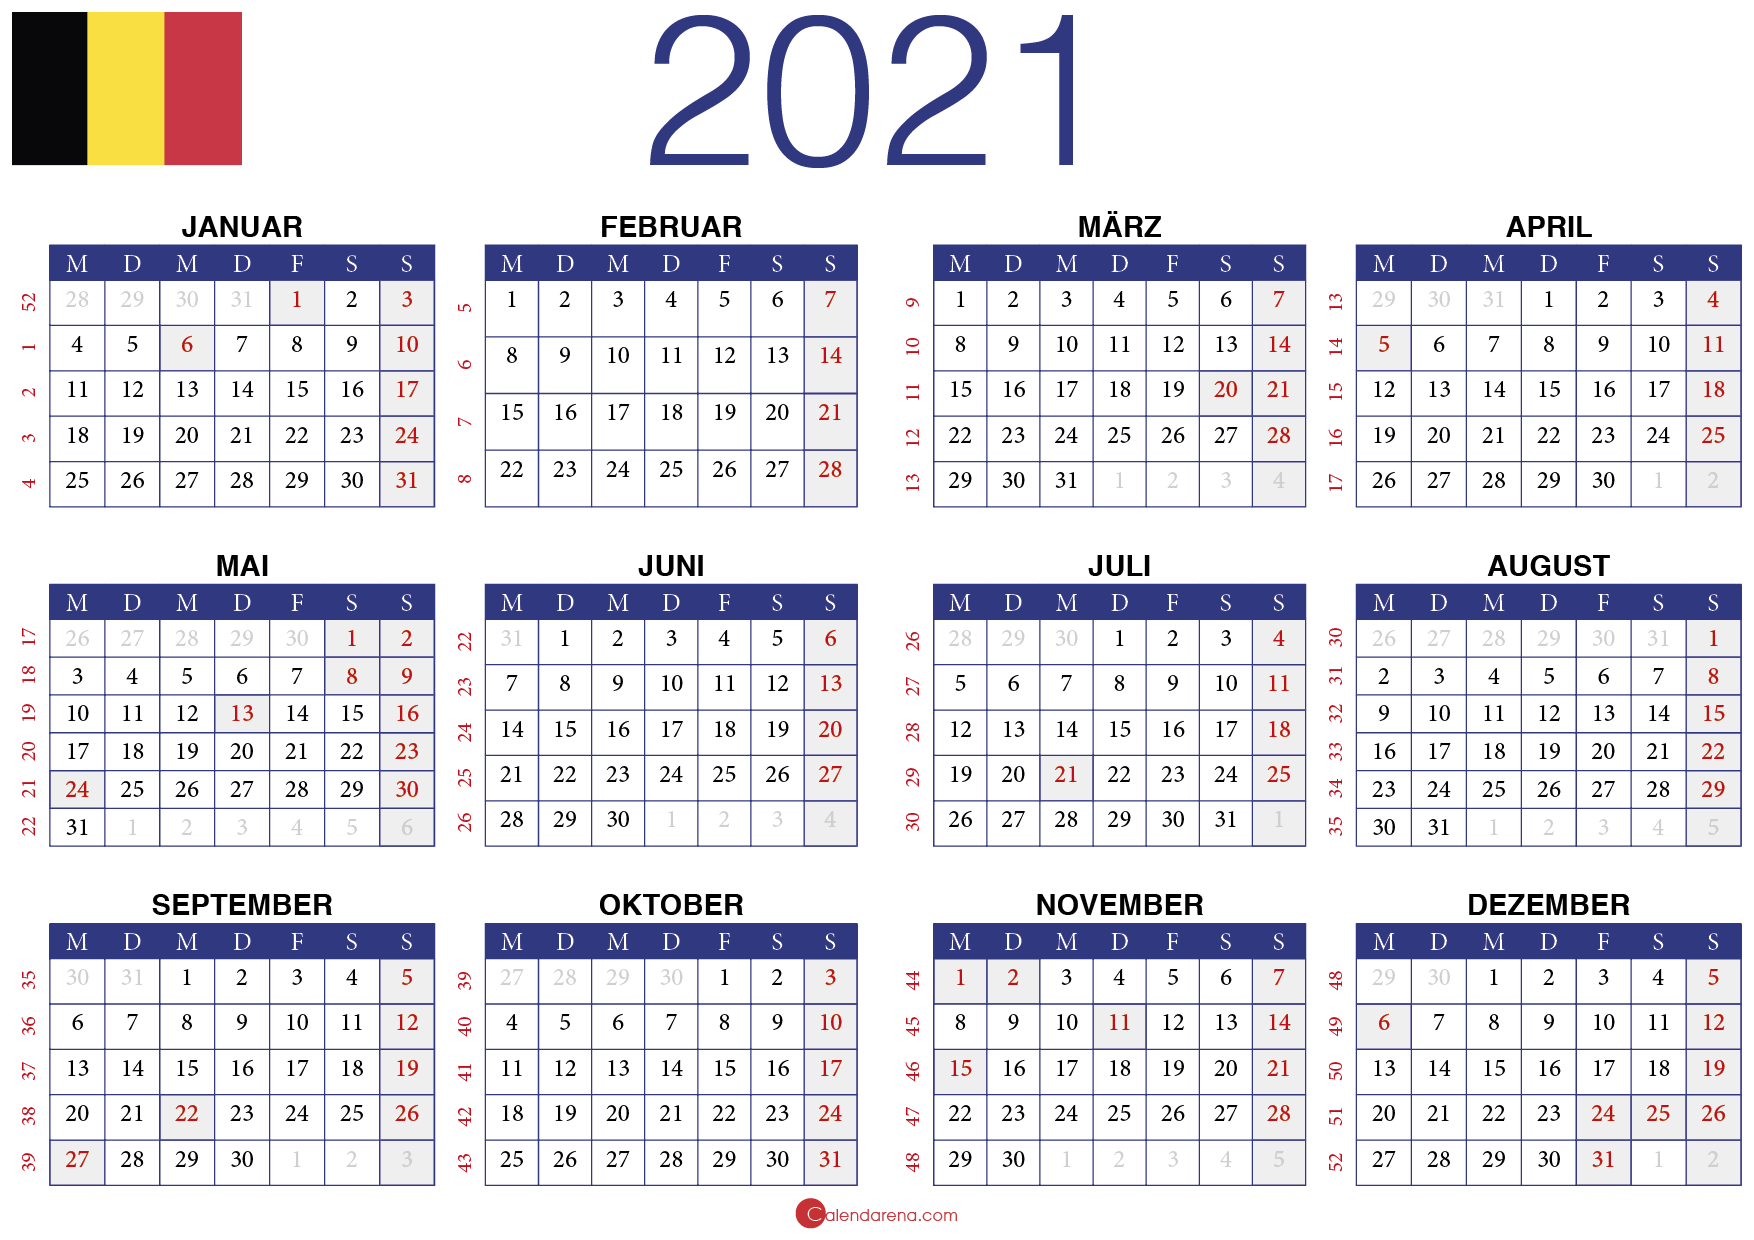 Jahreskalender 2021 Belgien🇧🇪